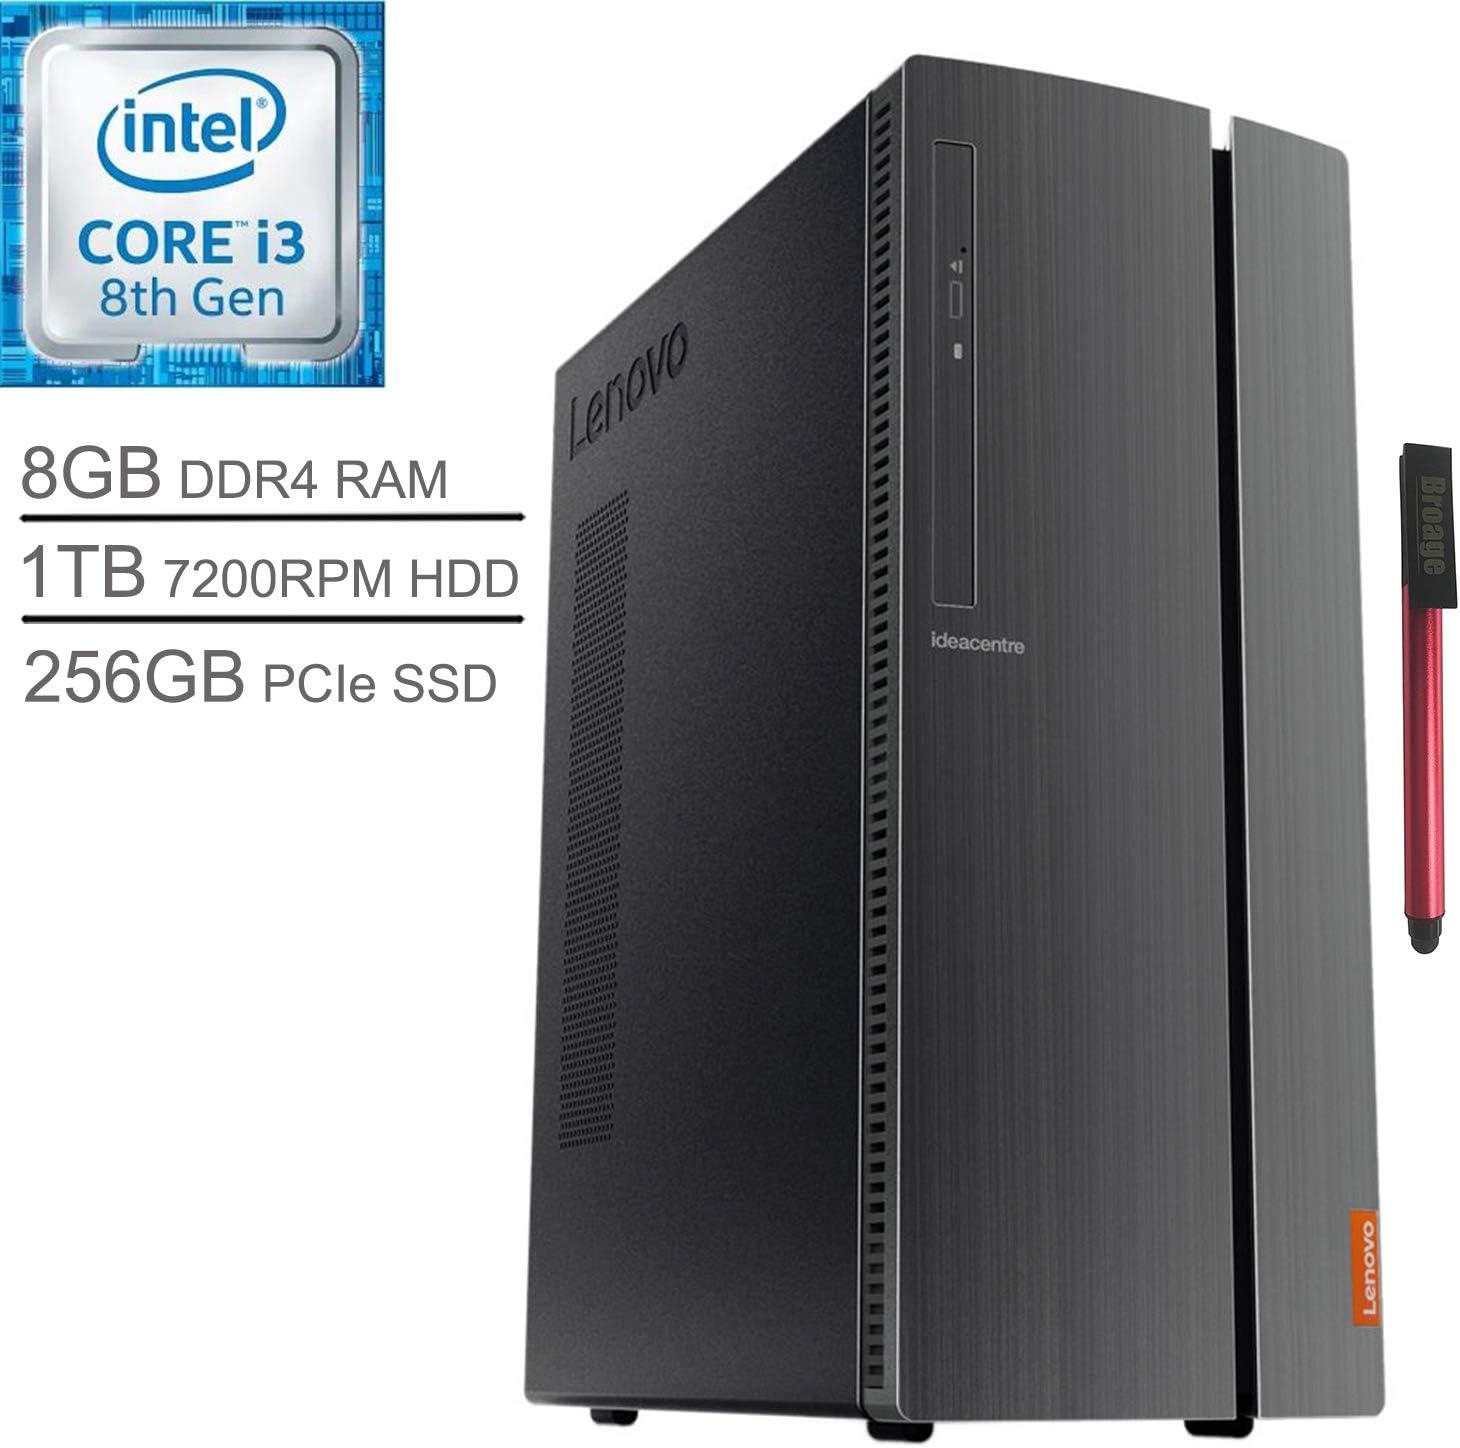 Lenovo IdeaCentre 510A Desktop Computer_ Intel Quad-Core i3-8100 3.6GHz (Beats i5-7500)_ 8GB DDR4 RAM_ 1TB 7200RPM HDD + 256GB PCIe SSD_ DVDRW_ 802.11AC WiFi_ Windows 10_ BROAGE 64GB Flash Drive